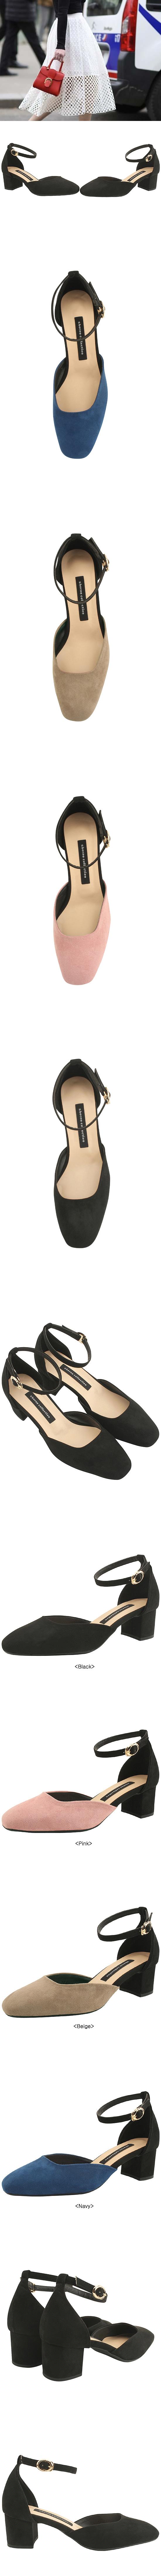 Ankle Strap Two-tone Full Heel Middle Heel Beige